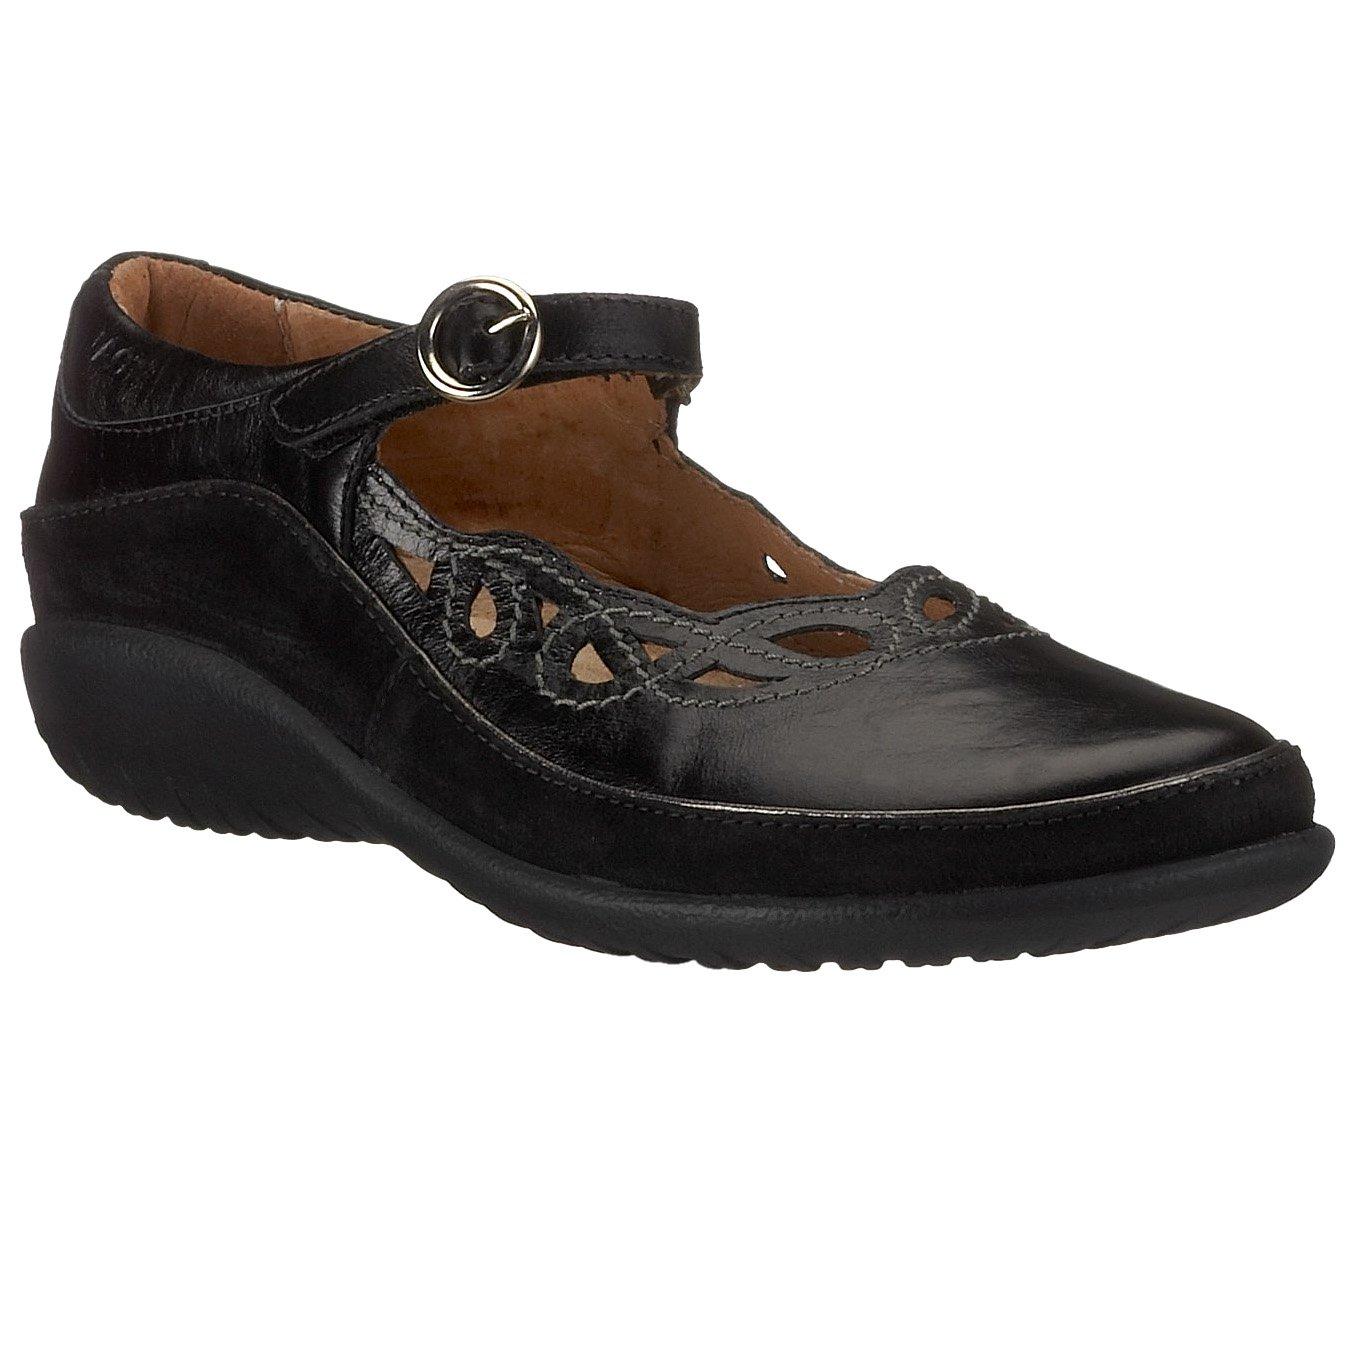 Naot Women's Rahina Mary Jane Flat, Black Leather/Black Suede, 37 EU/6-6.5 M US by NAOT